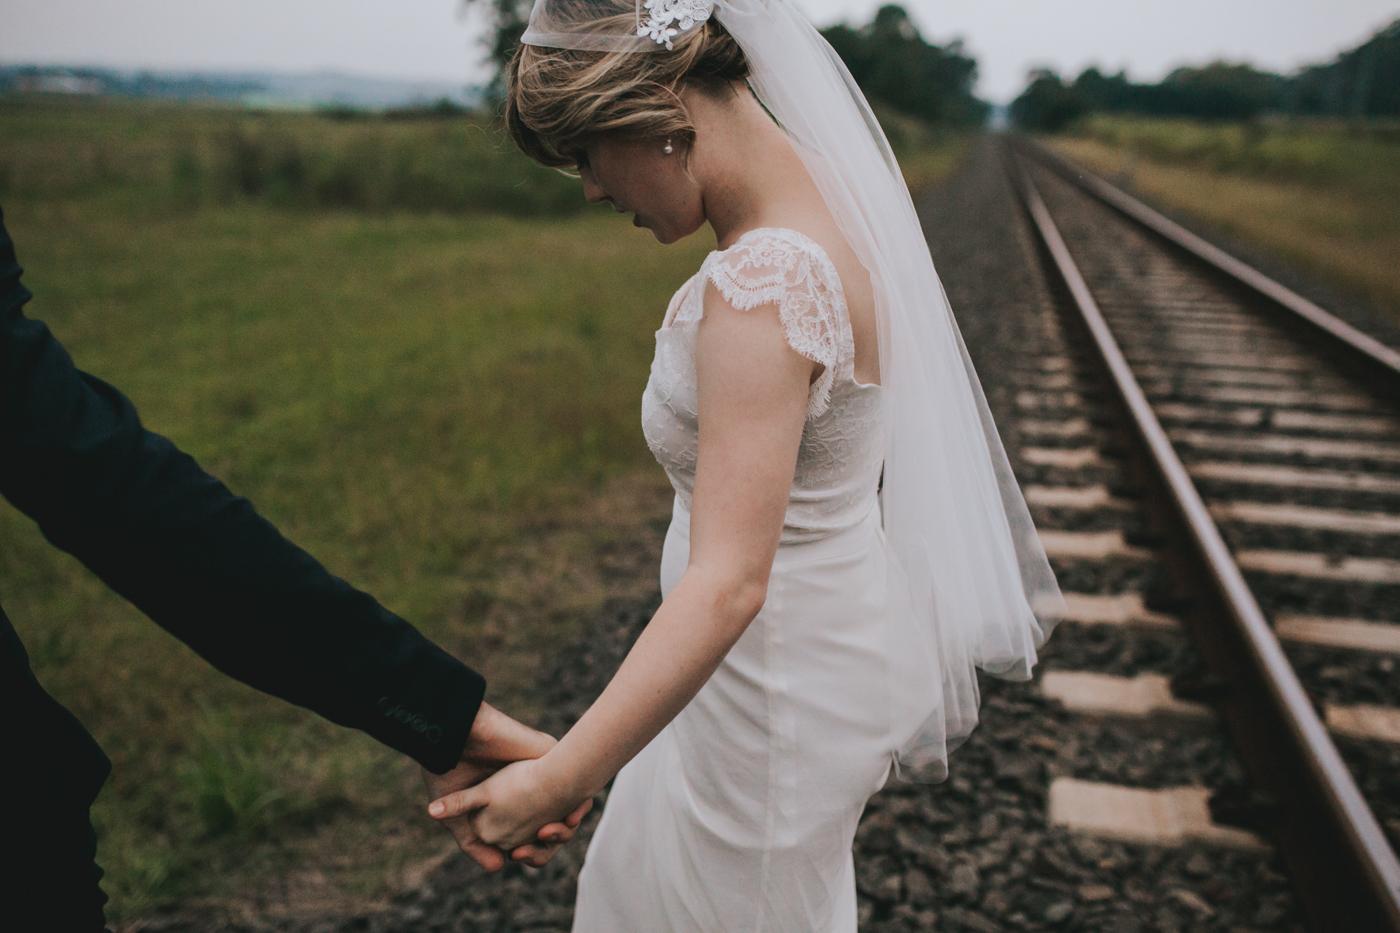 Rachel & Jacob - Willow Farm Berry - South Coast Wedding - Samantha Heather Photography-170.jpg